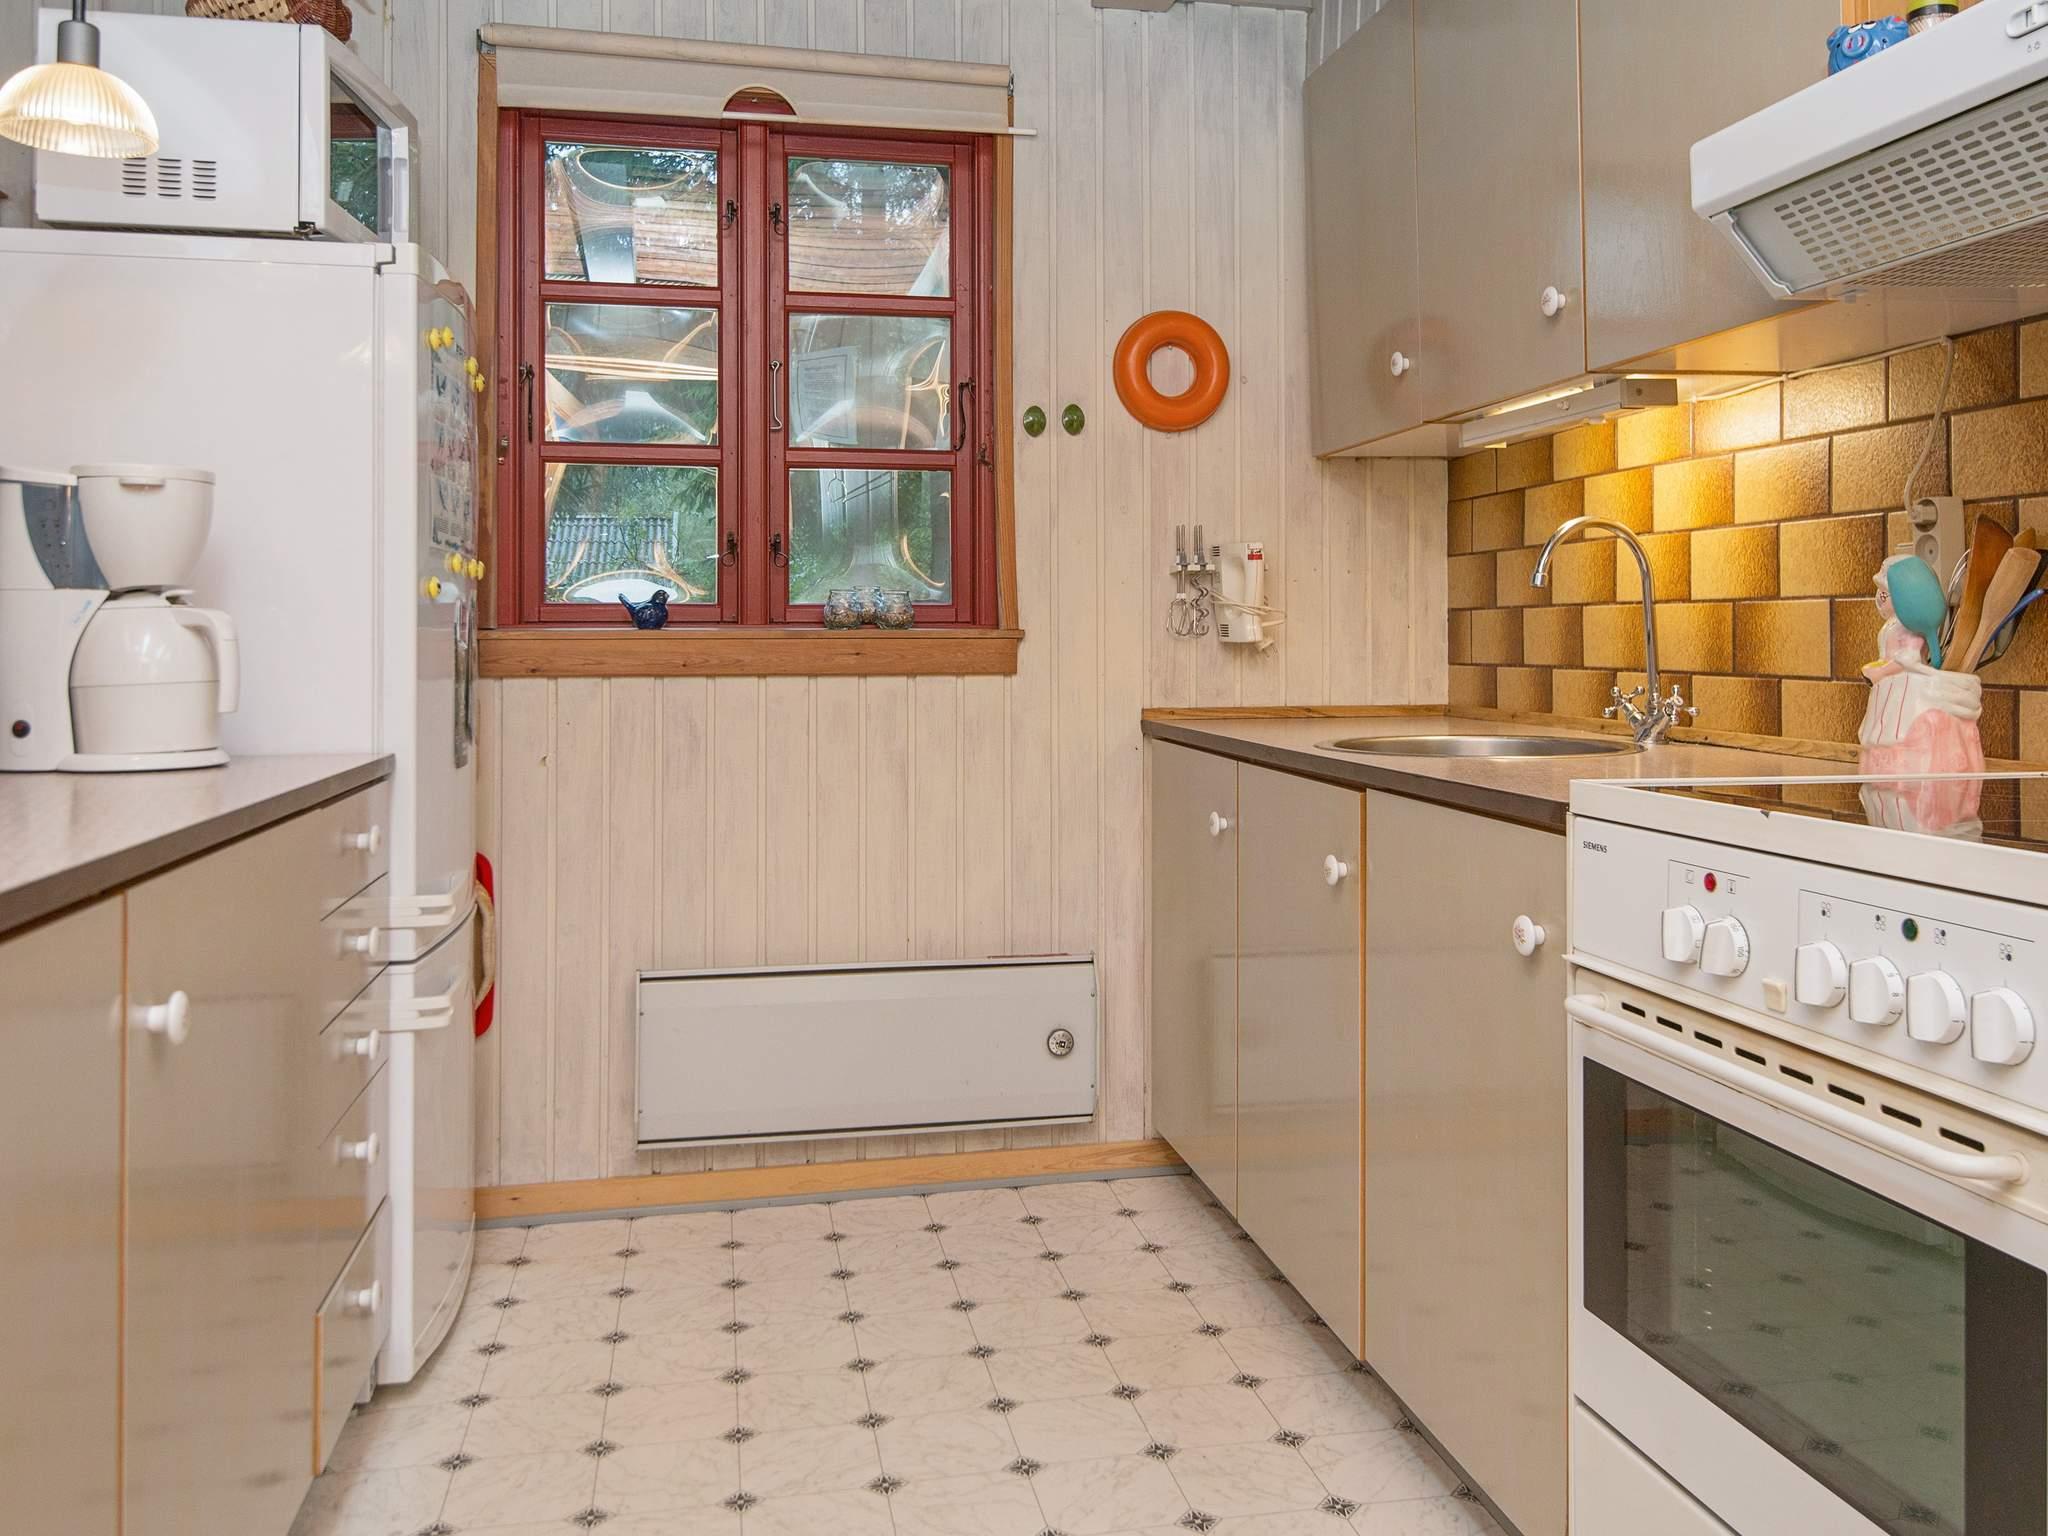 Ferienhaus Arrild (306971), Arrild, , Südwestjütland, Dänemark, Bild 5